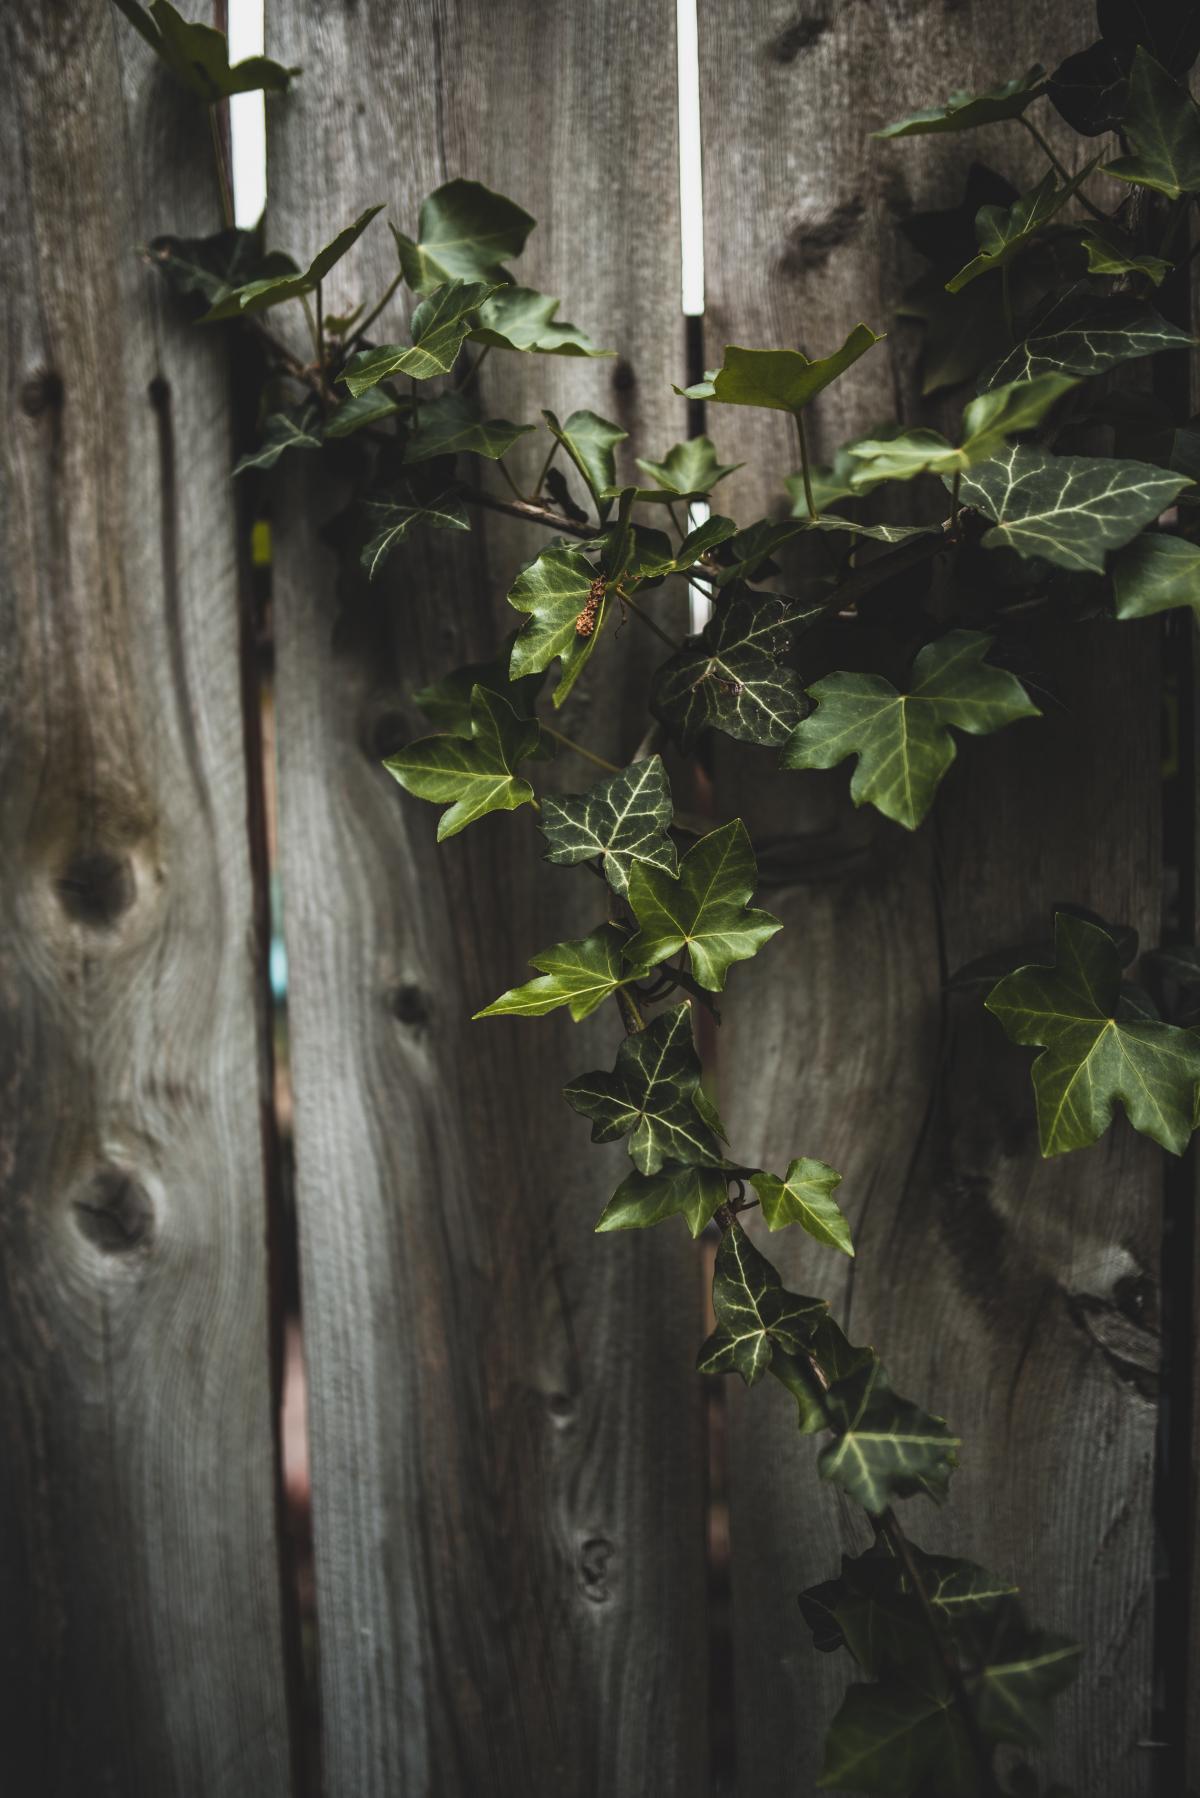 Tree Woody plant Vascular plant #422255